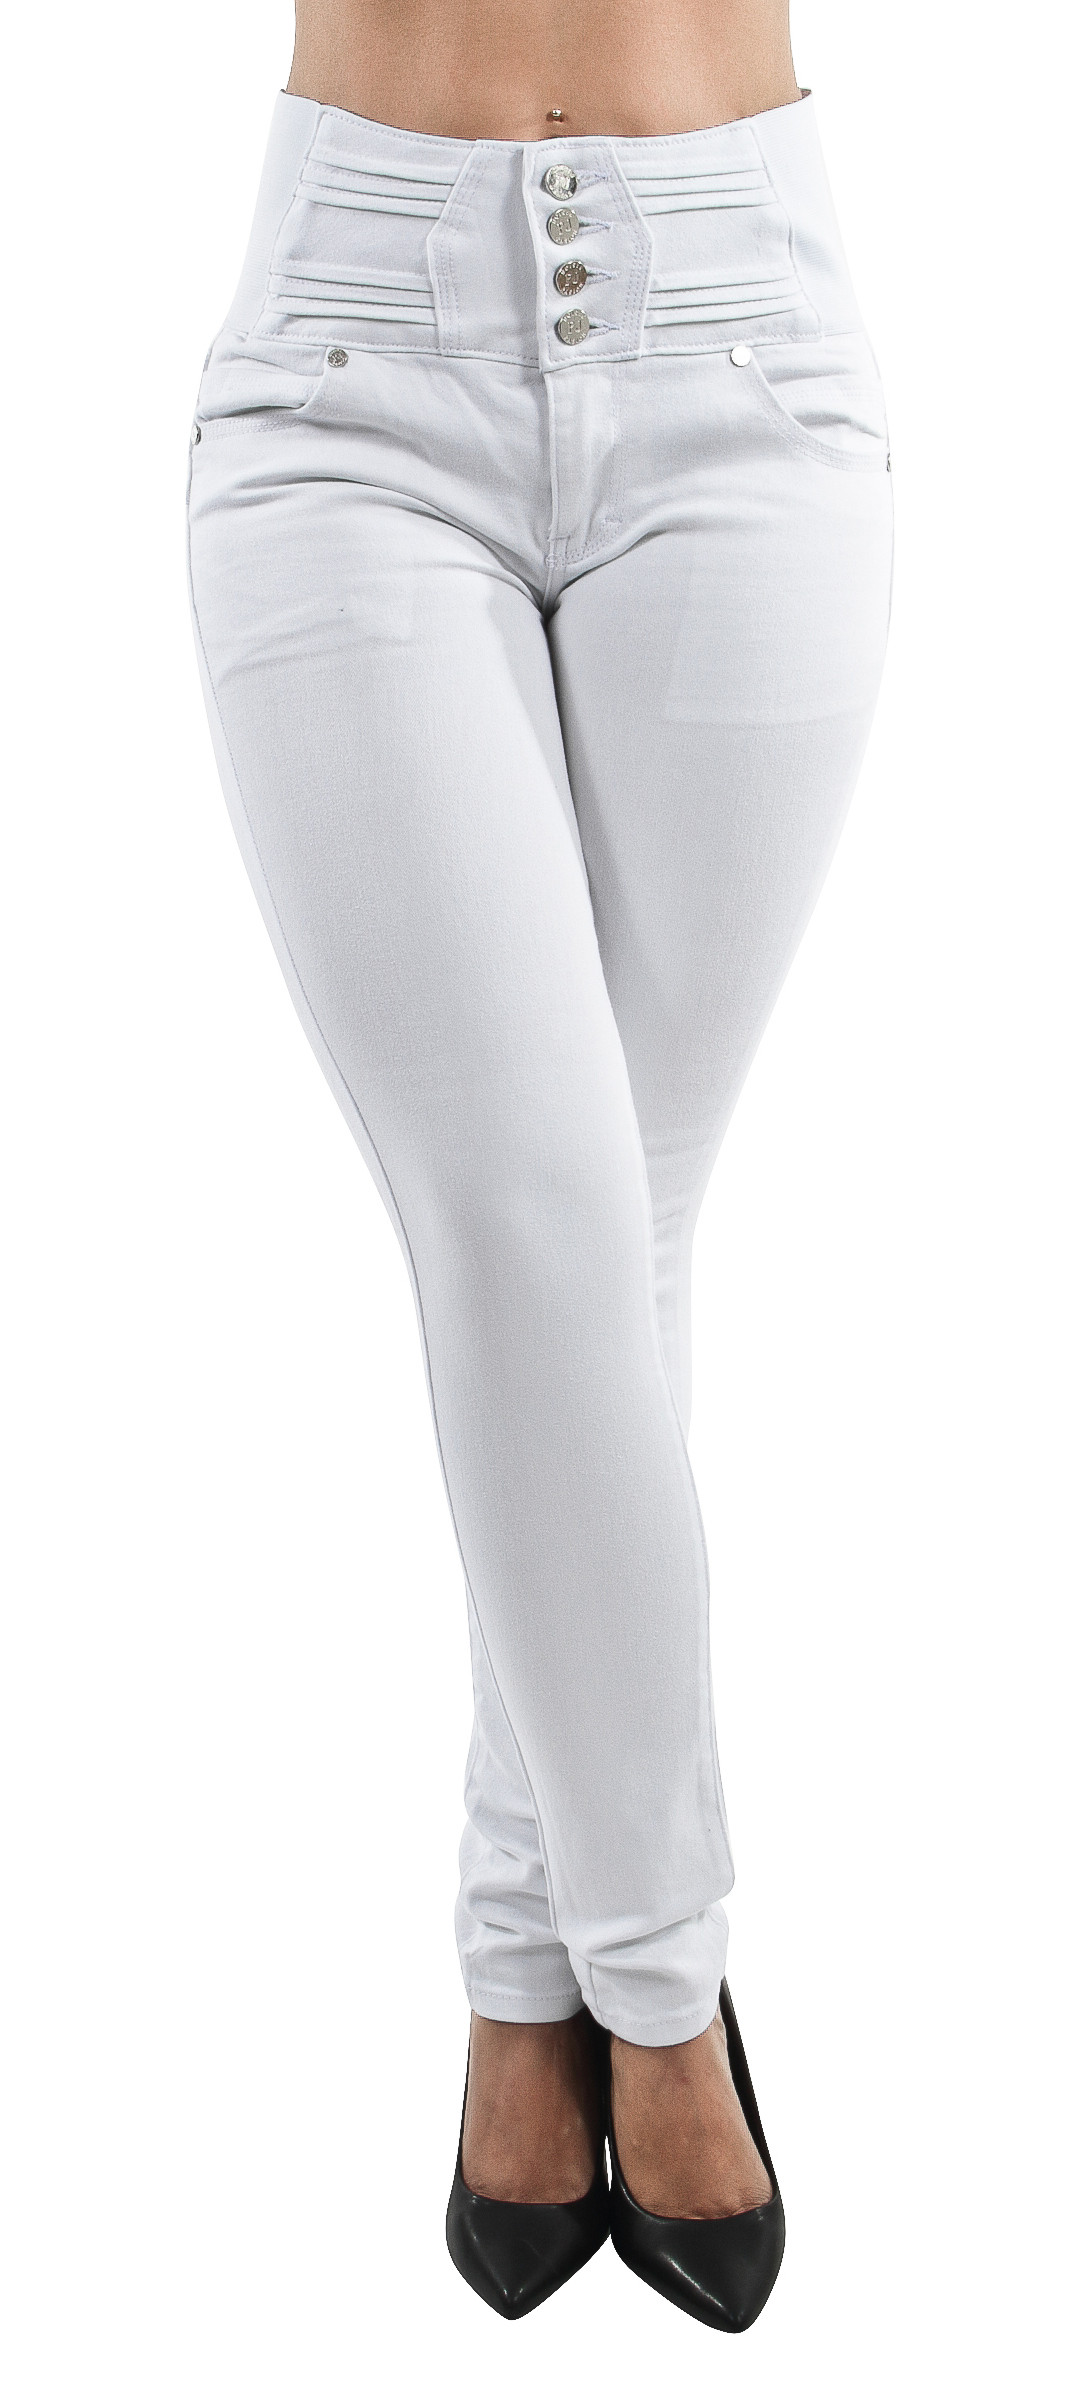 Butt Lift Women/'s Juniors Skinny Jeans Push Up Elastic High Waist